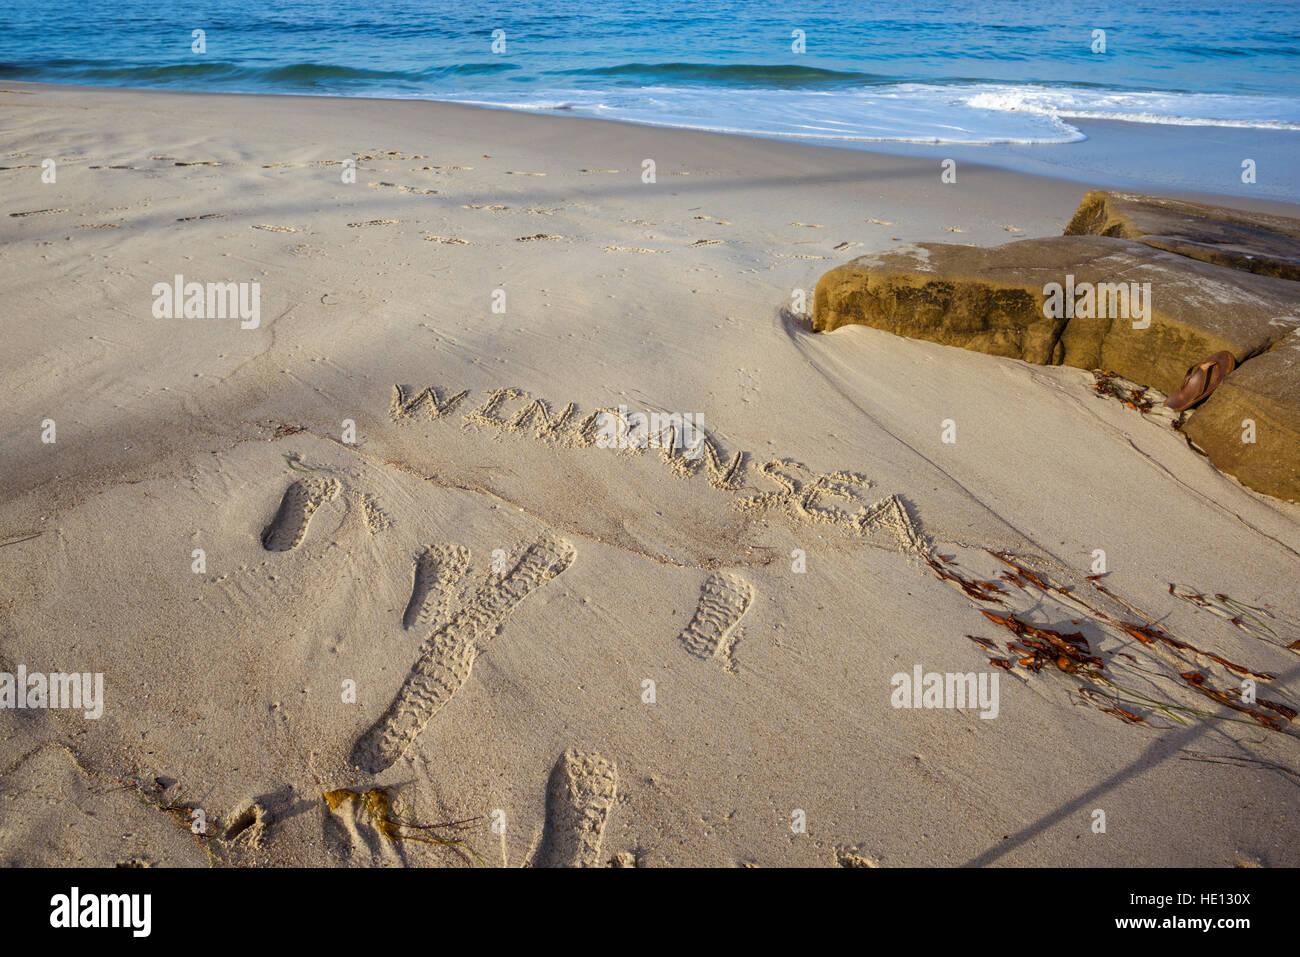 "das Wort ""Windansea"" in den Sand geschrieben. Windansea Beach, La Jolla, Kalifornien. Stockfoto"